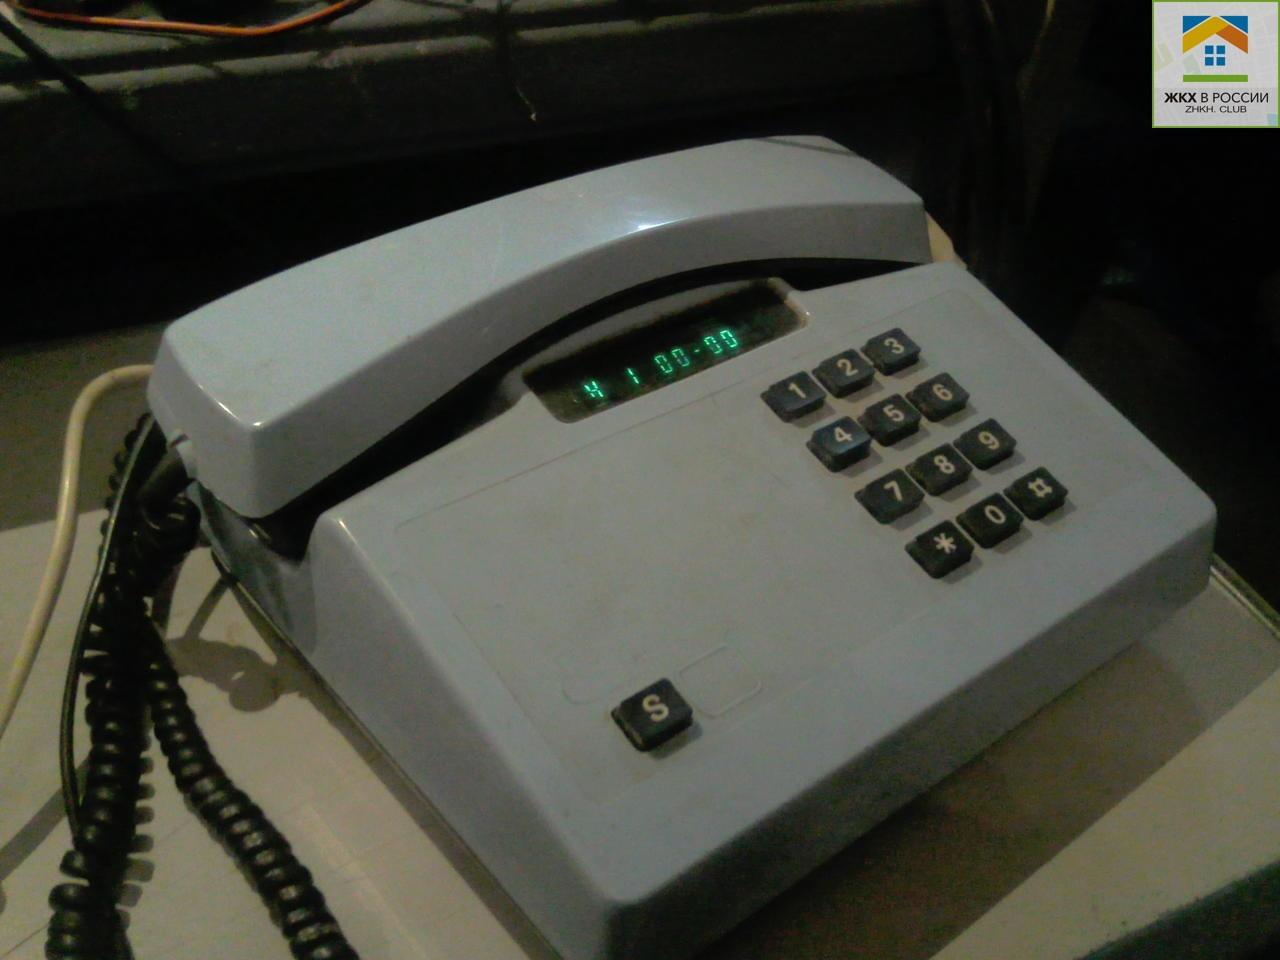 Телефон с АОН